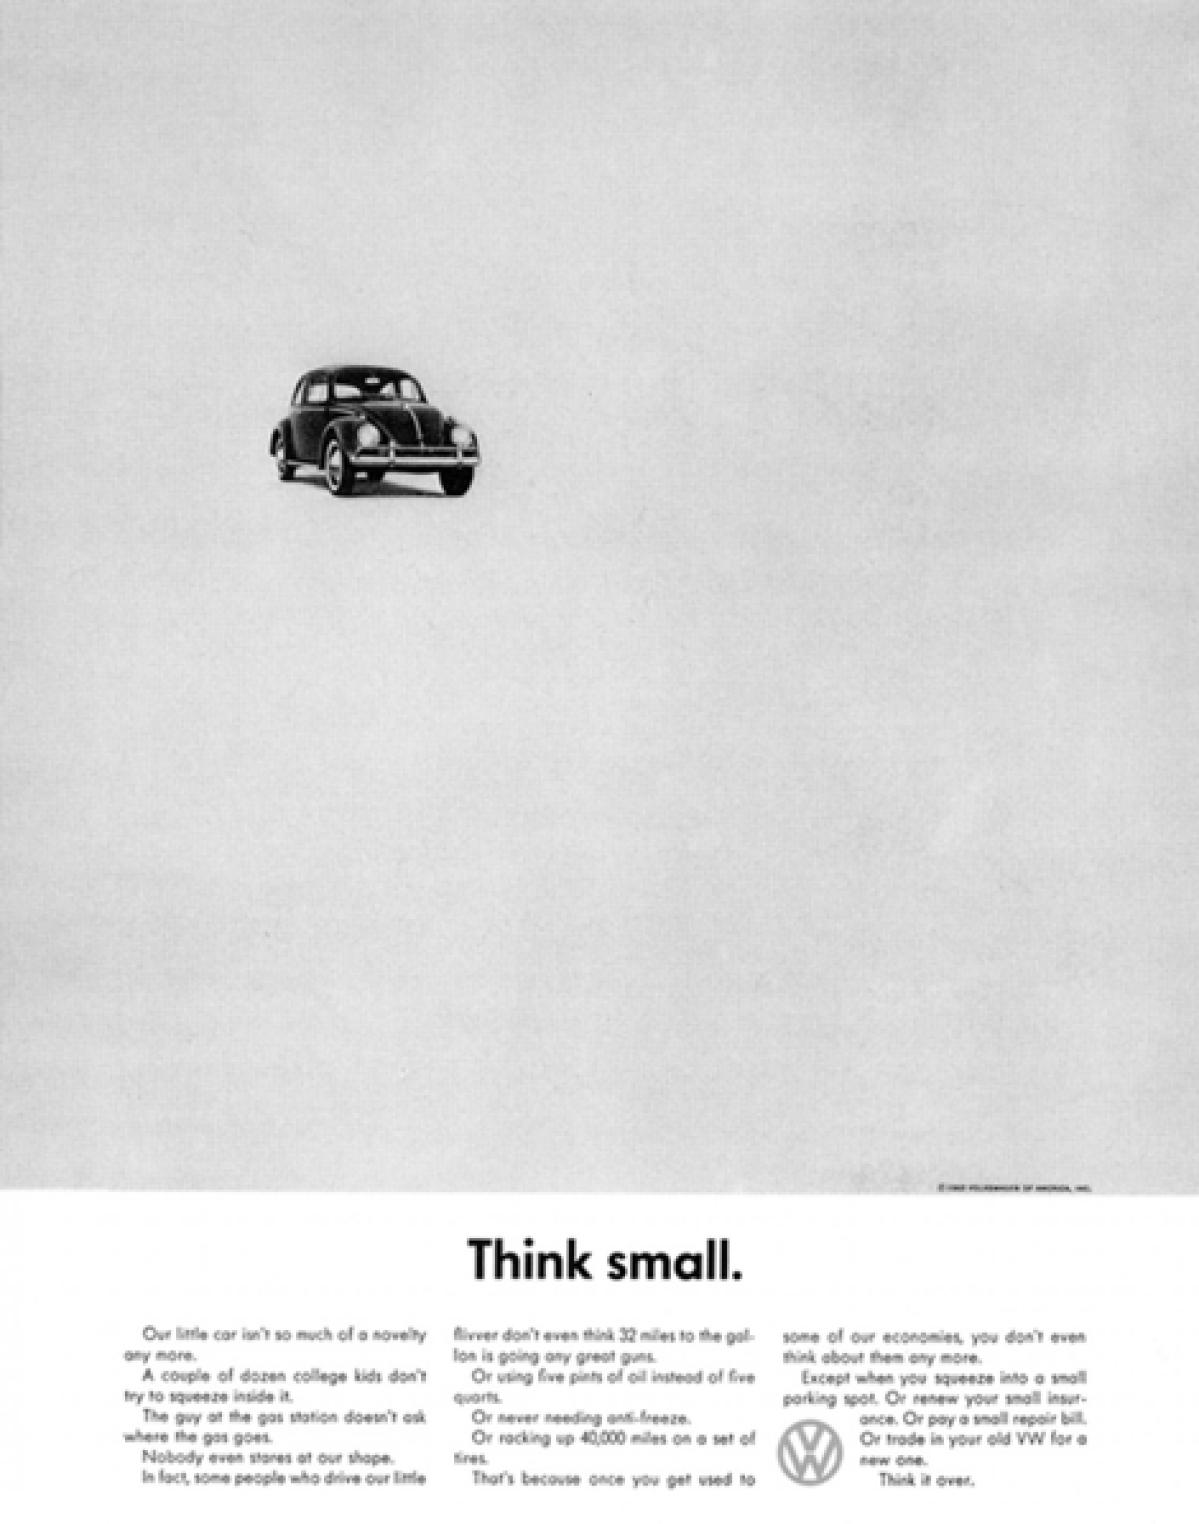 A 1959 Volkswagen ad